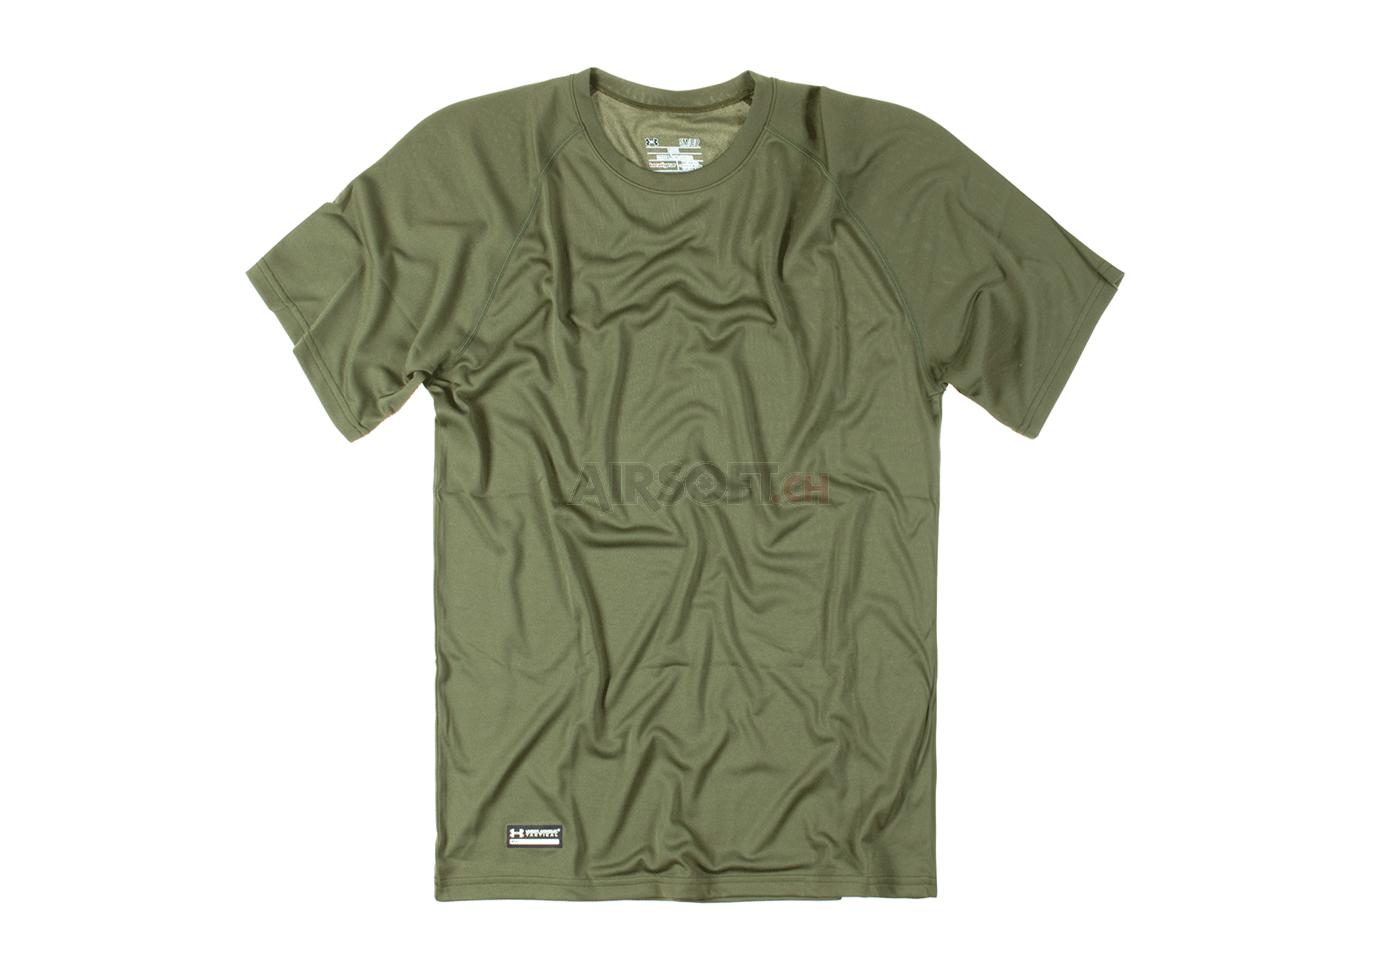 74c7bcccfeaf UA Tactical Tech Tee OD (Under Armour) M - T-Shirts - Shirts ...